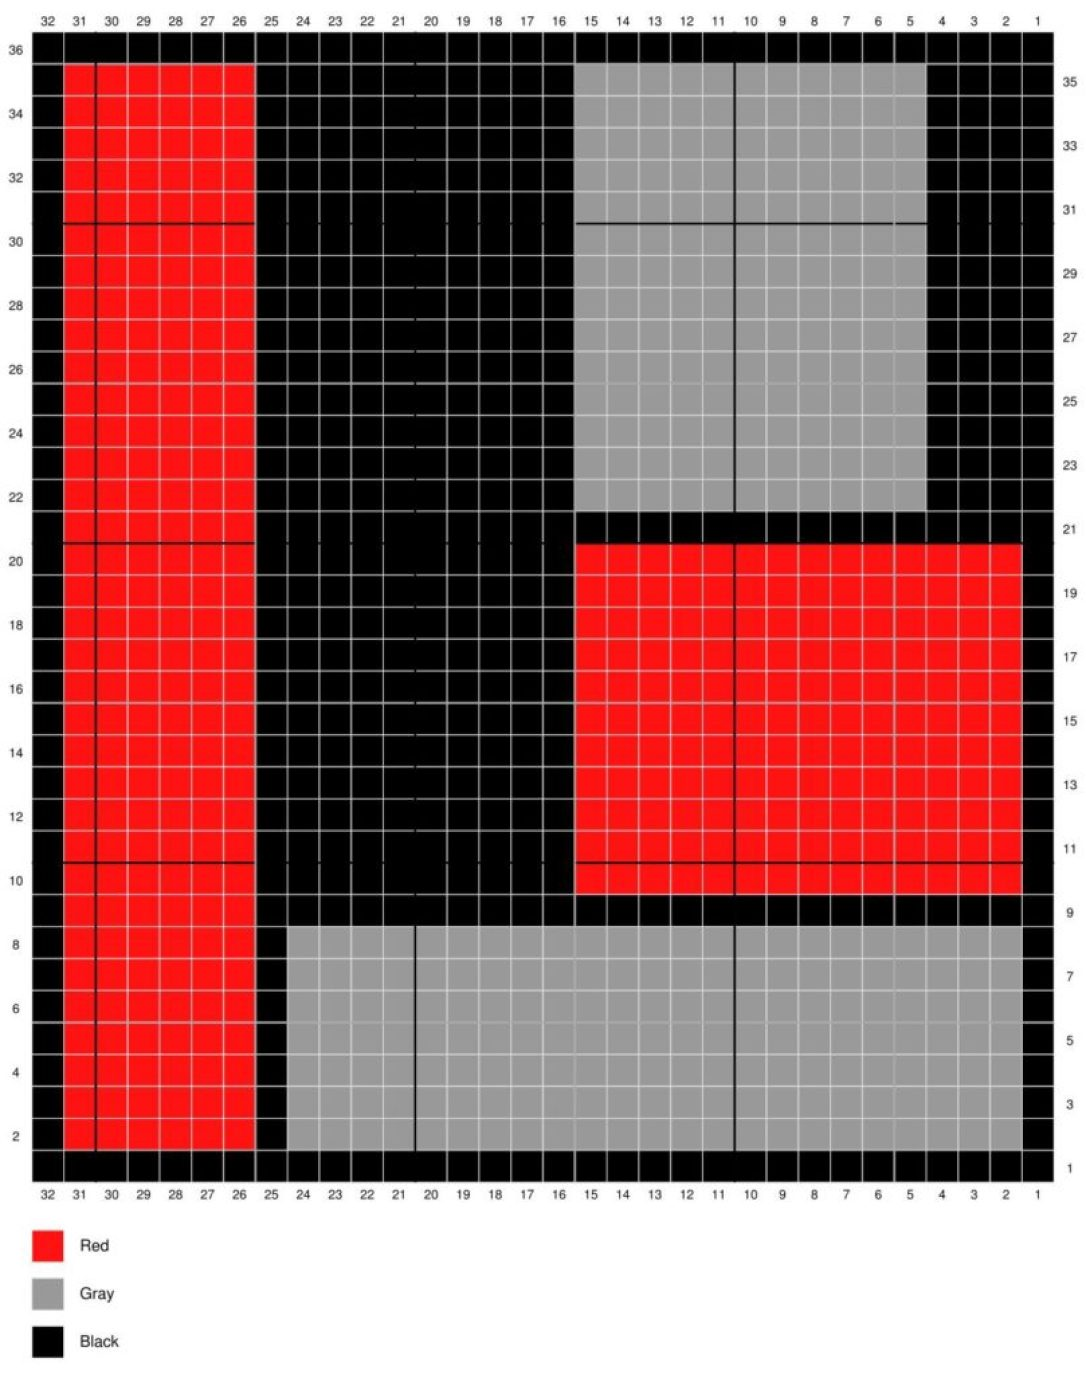 Stitch Diagram Color Block Washcloth from HookedforLifePublishing.com